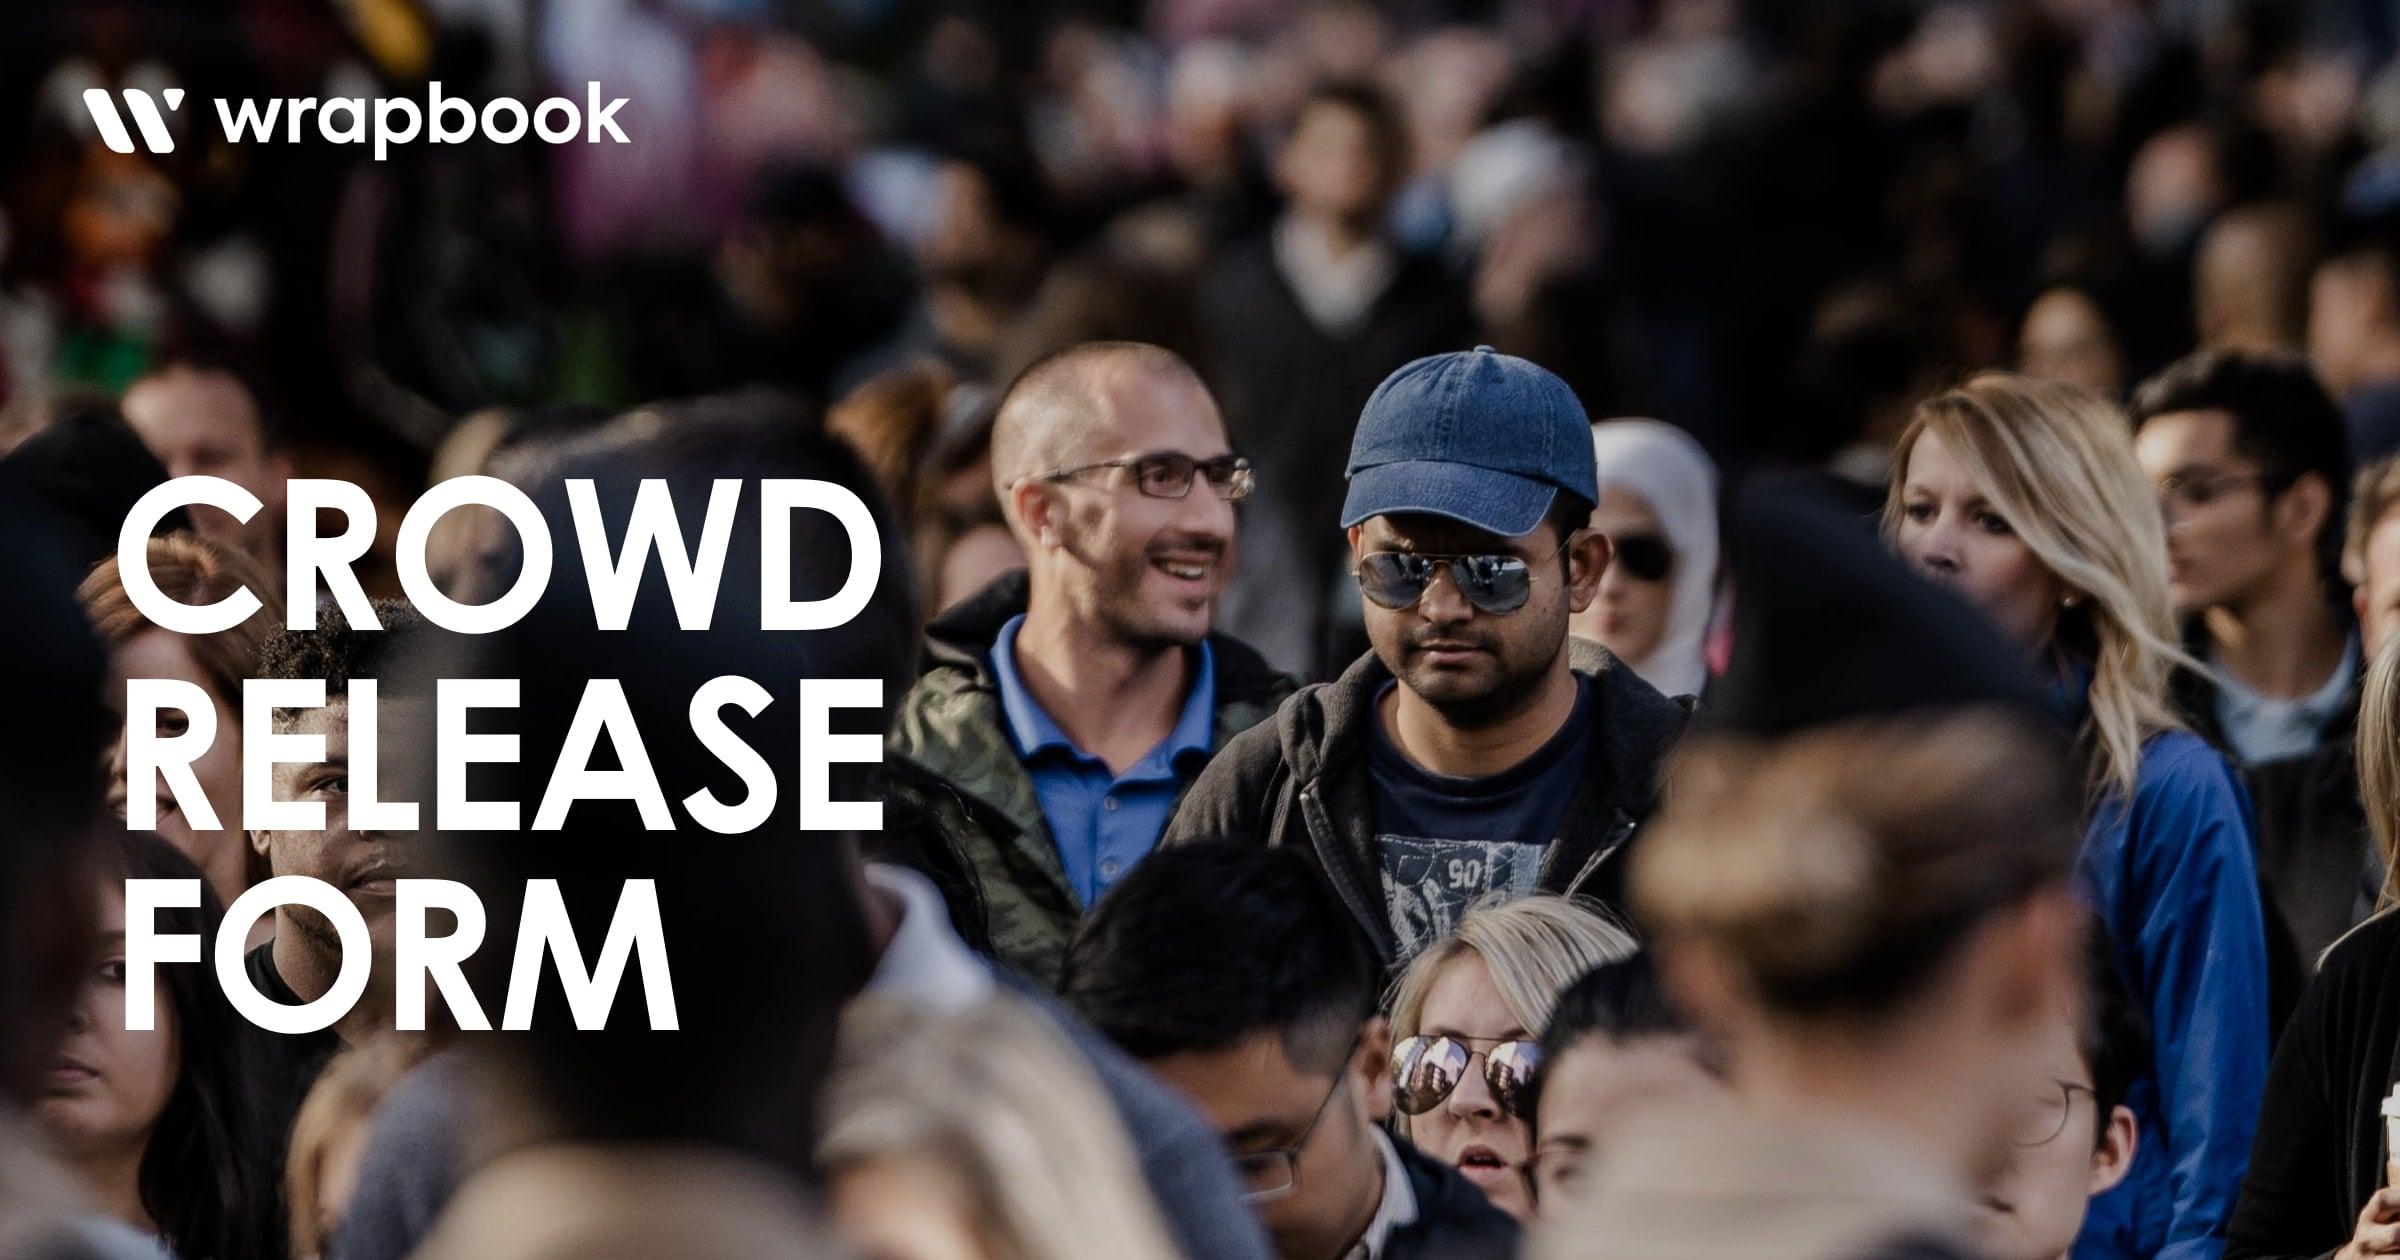 Model Release Form - Crowd Release Form - Wrapbook